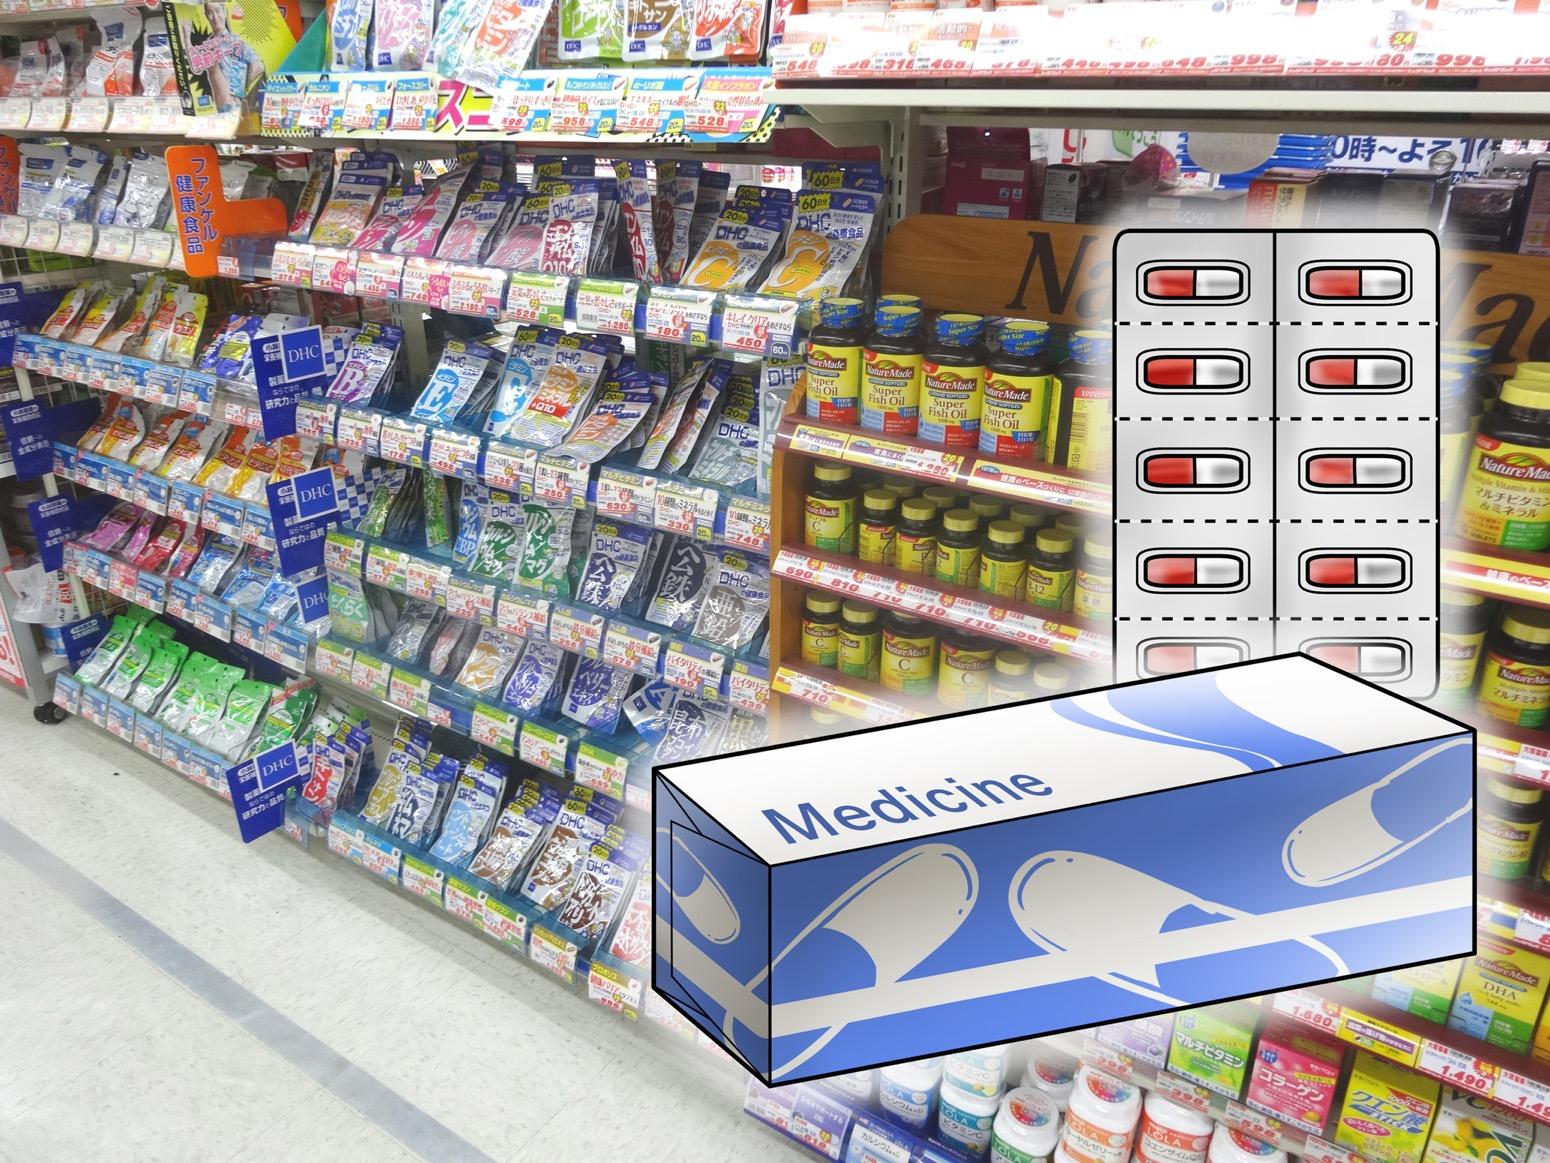 BIC DRUG SHIDAX Shinjuku Central Road Store